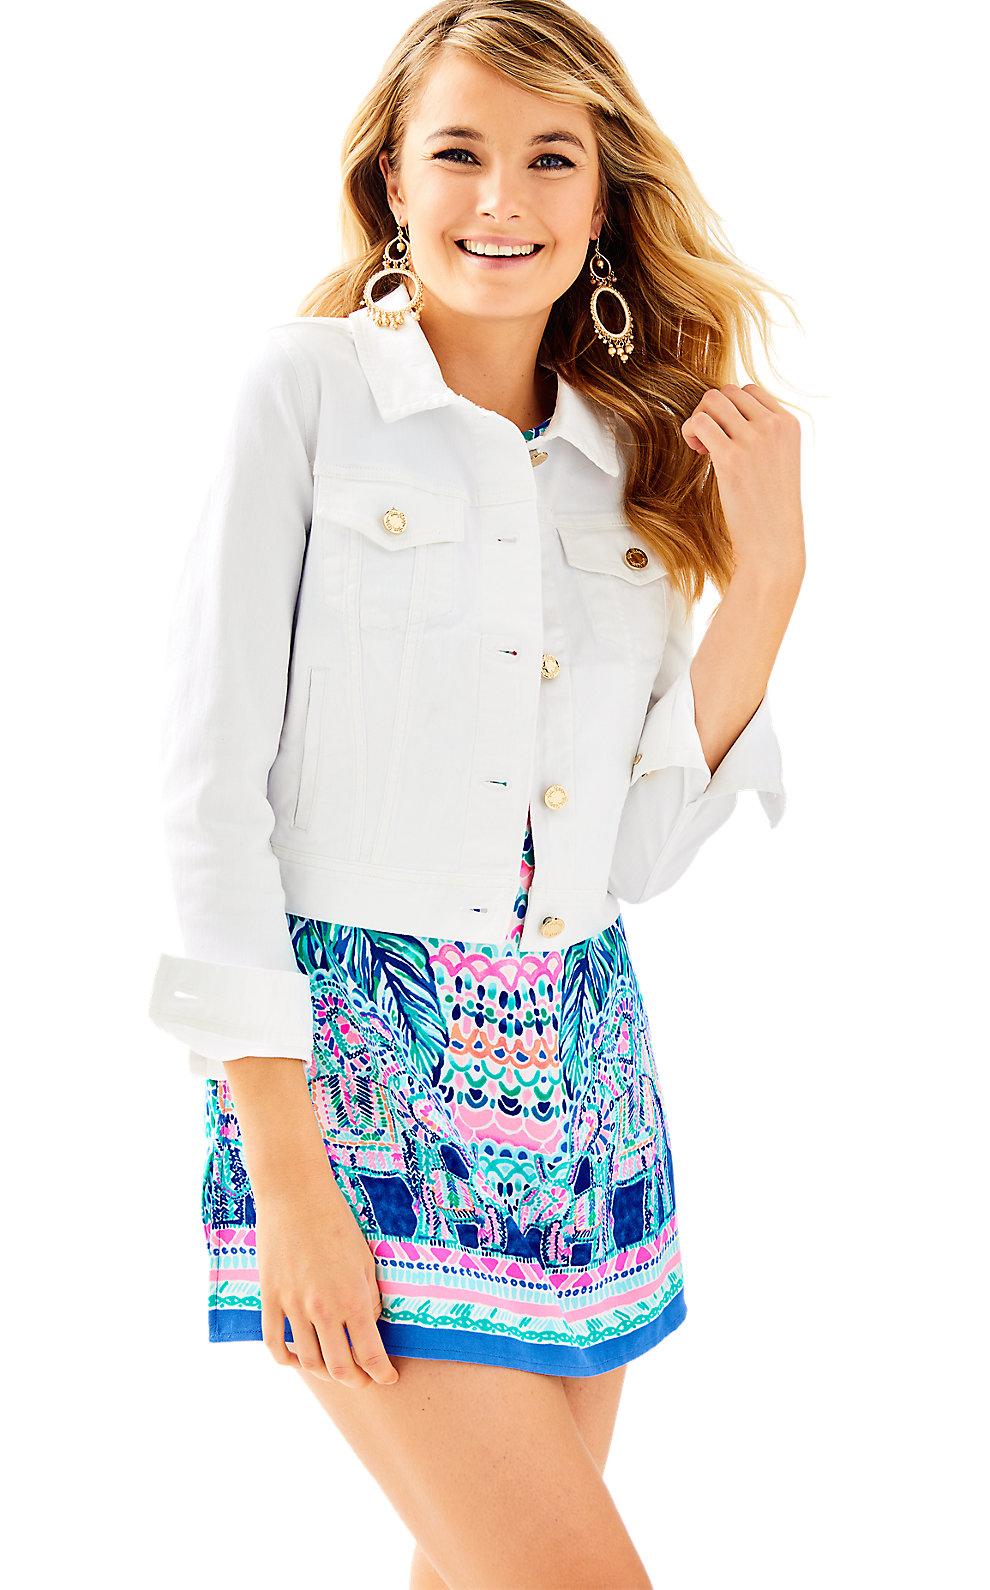 Womens Seaspray Denim Jacket in Resort White from Lilly Pulitzer